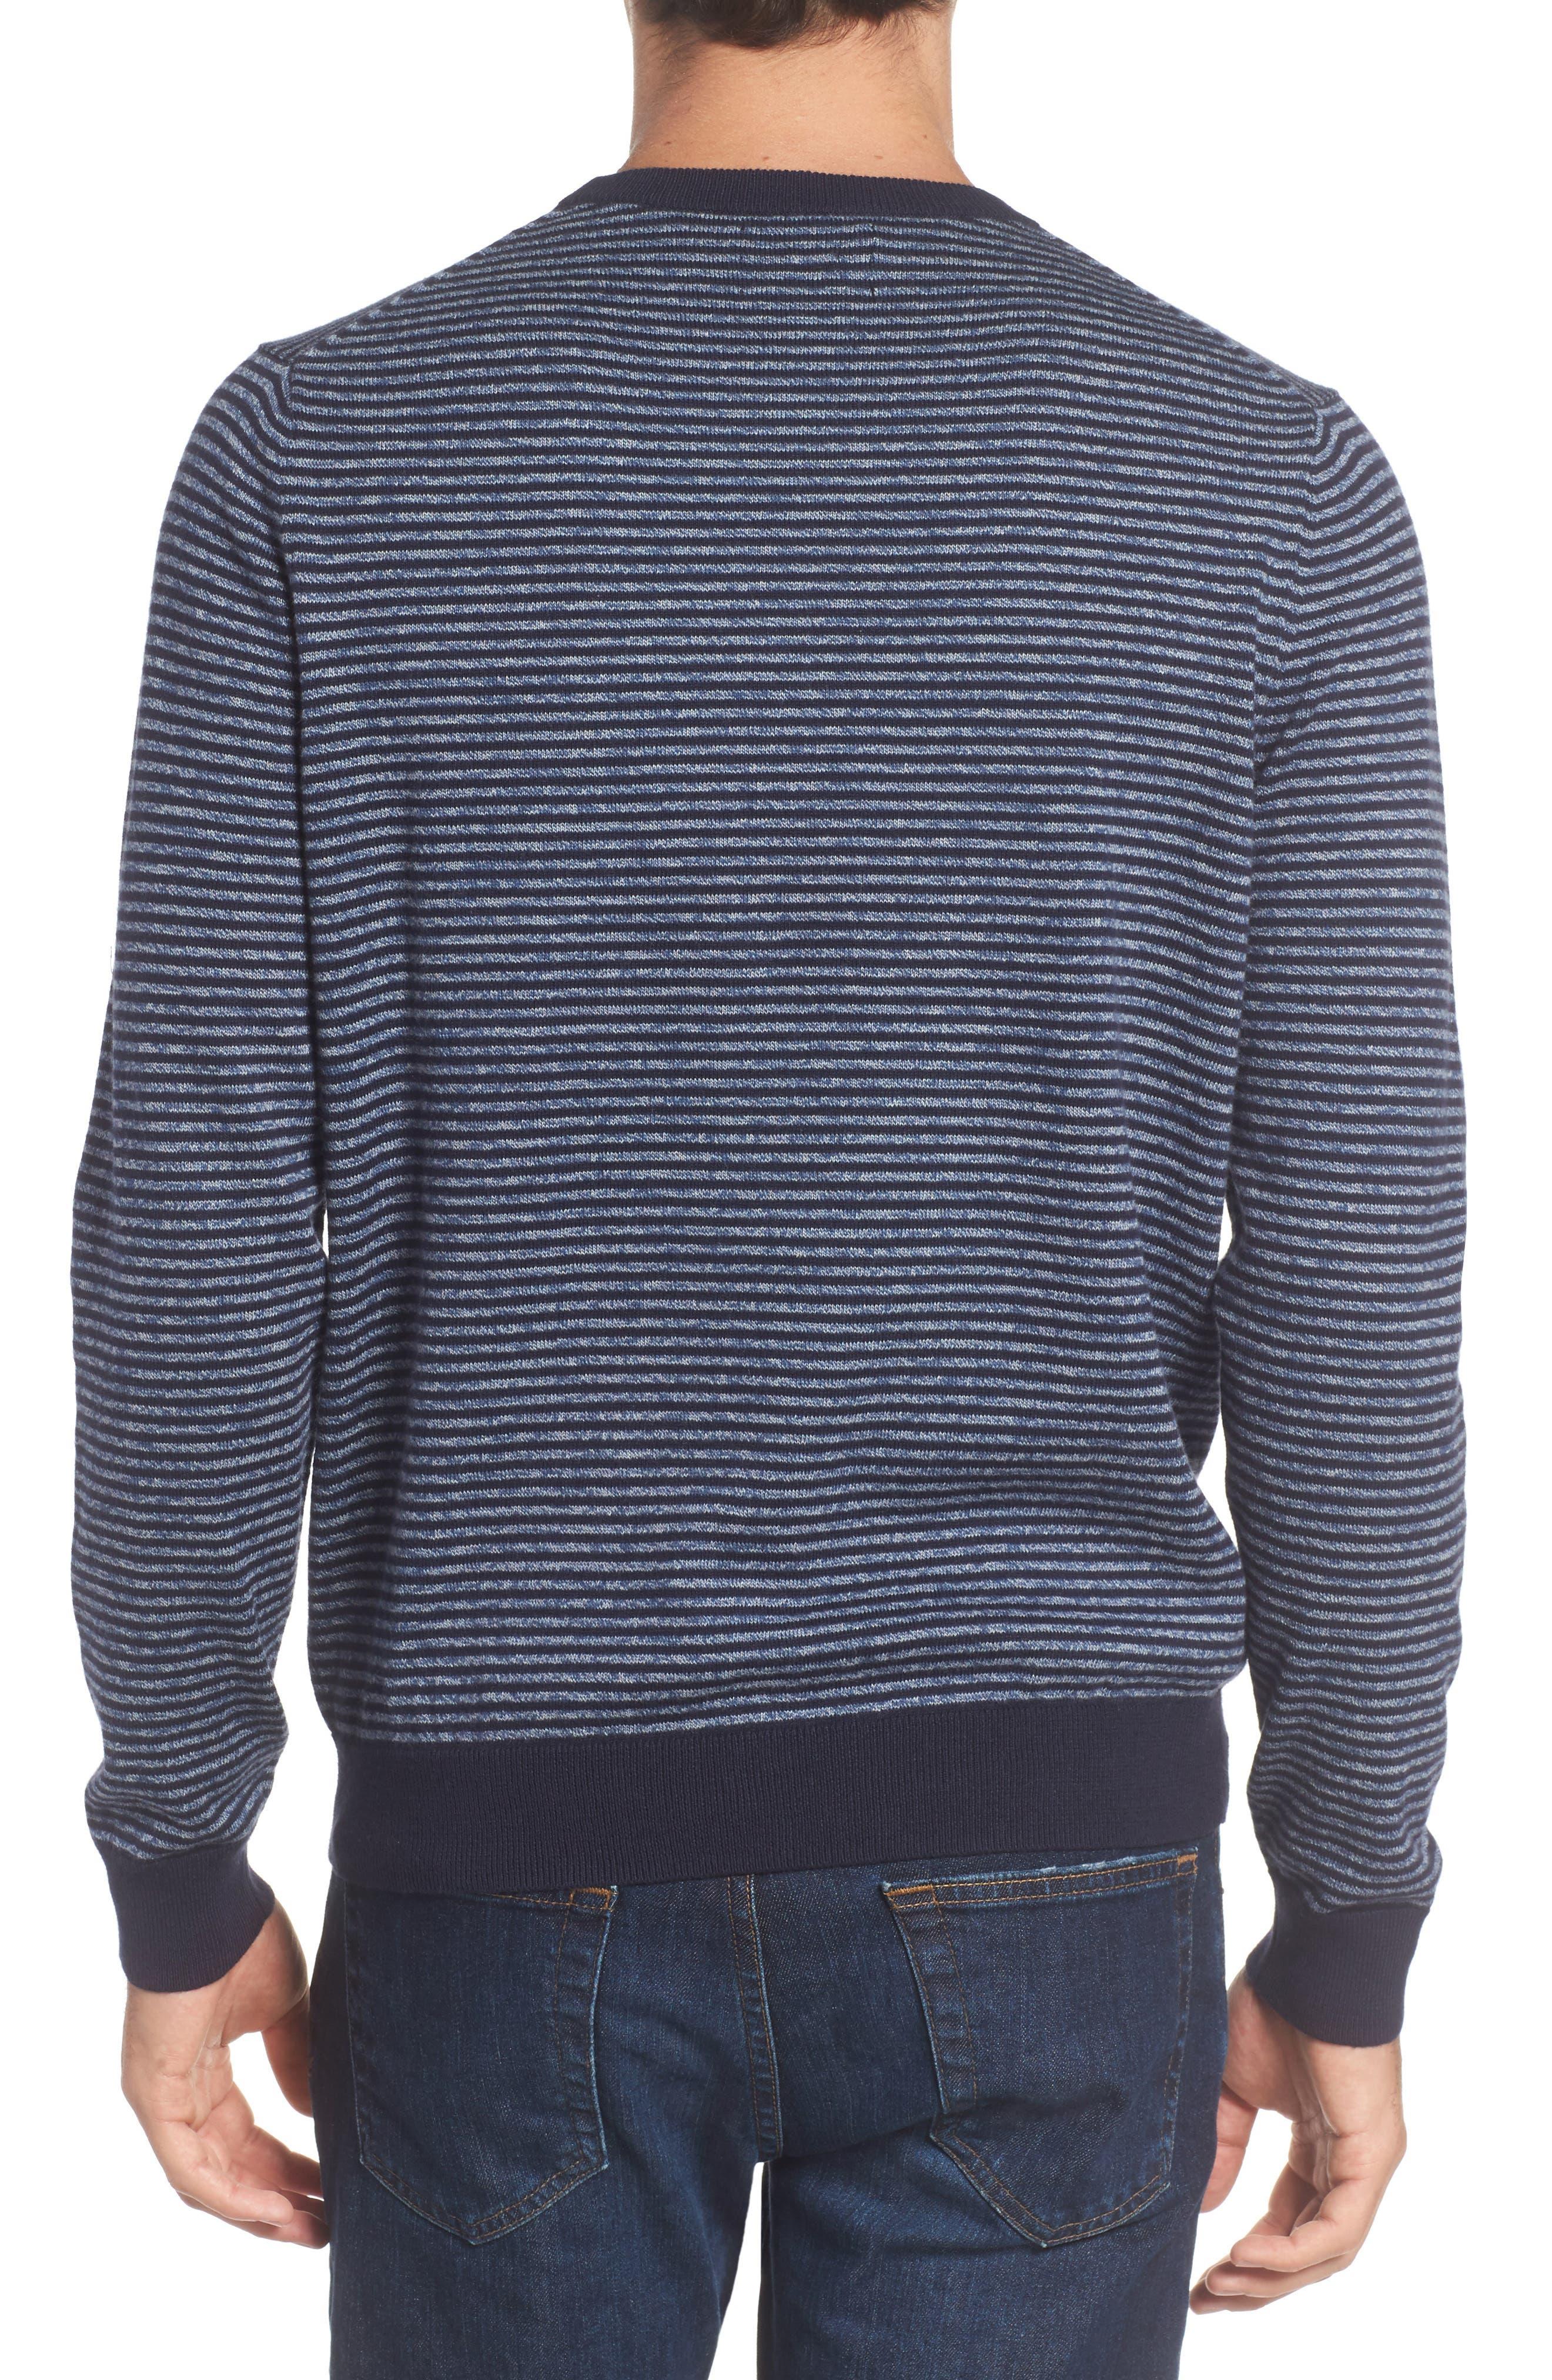 Stripe Cotton & Cashmere Crewneck Sweater,                             Alternate thumbnail 2, color,                             Navy Iris Jaspe Stripe